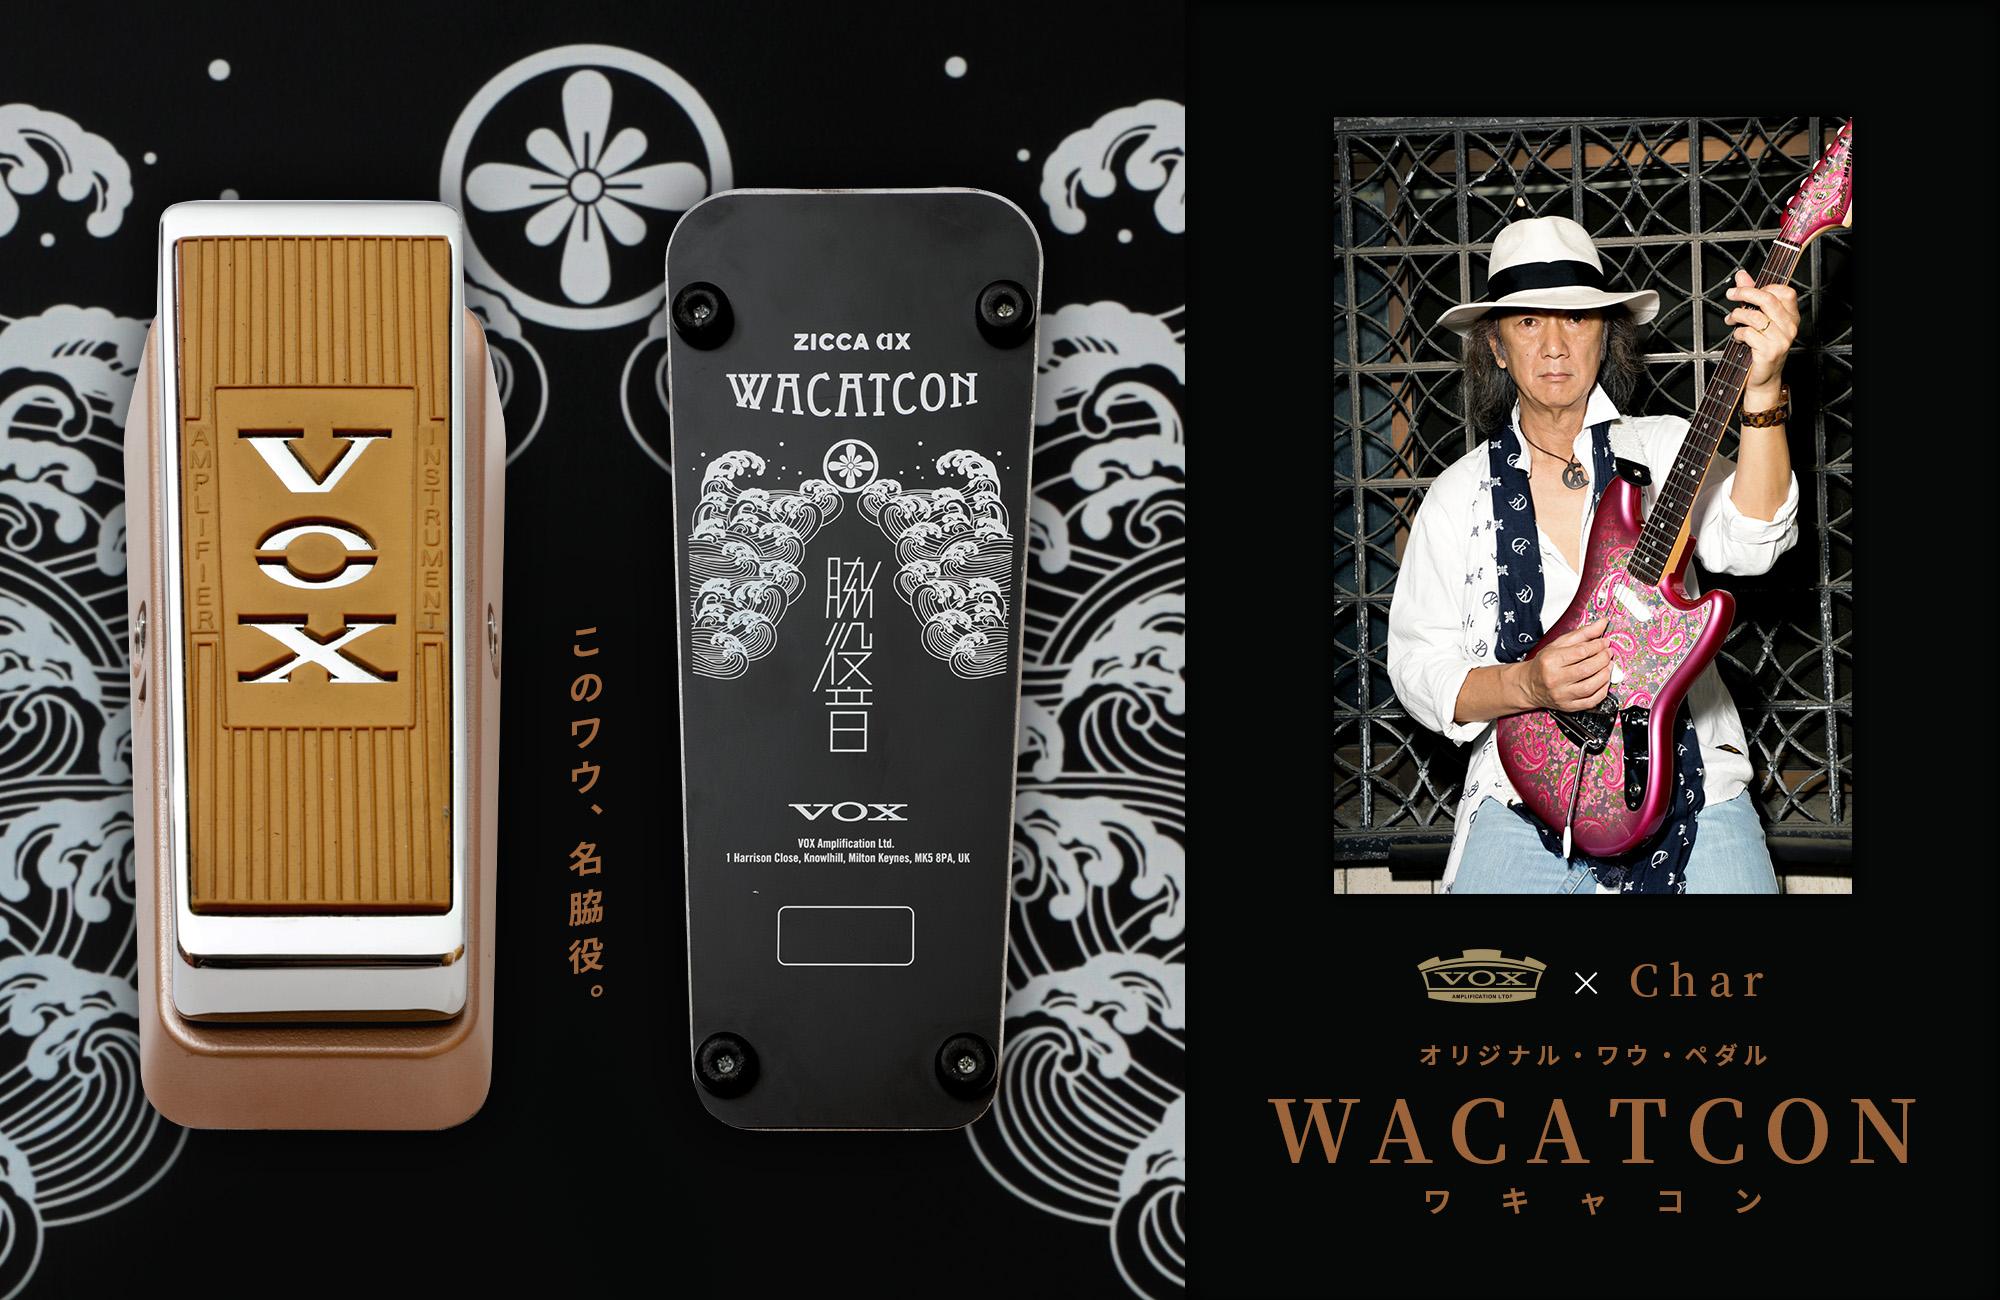 VOX - WACATCON(ワキャコン) | VOX × Char オリジナルワウ・ペダル【イシバシ楽器】